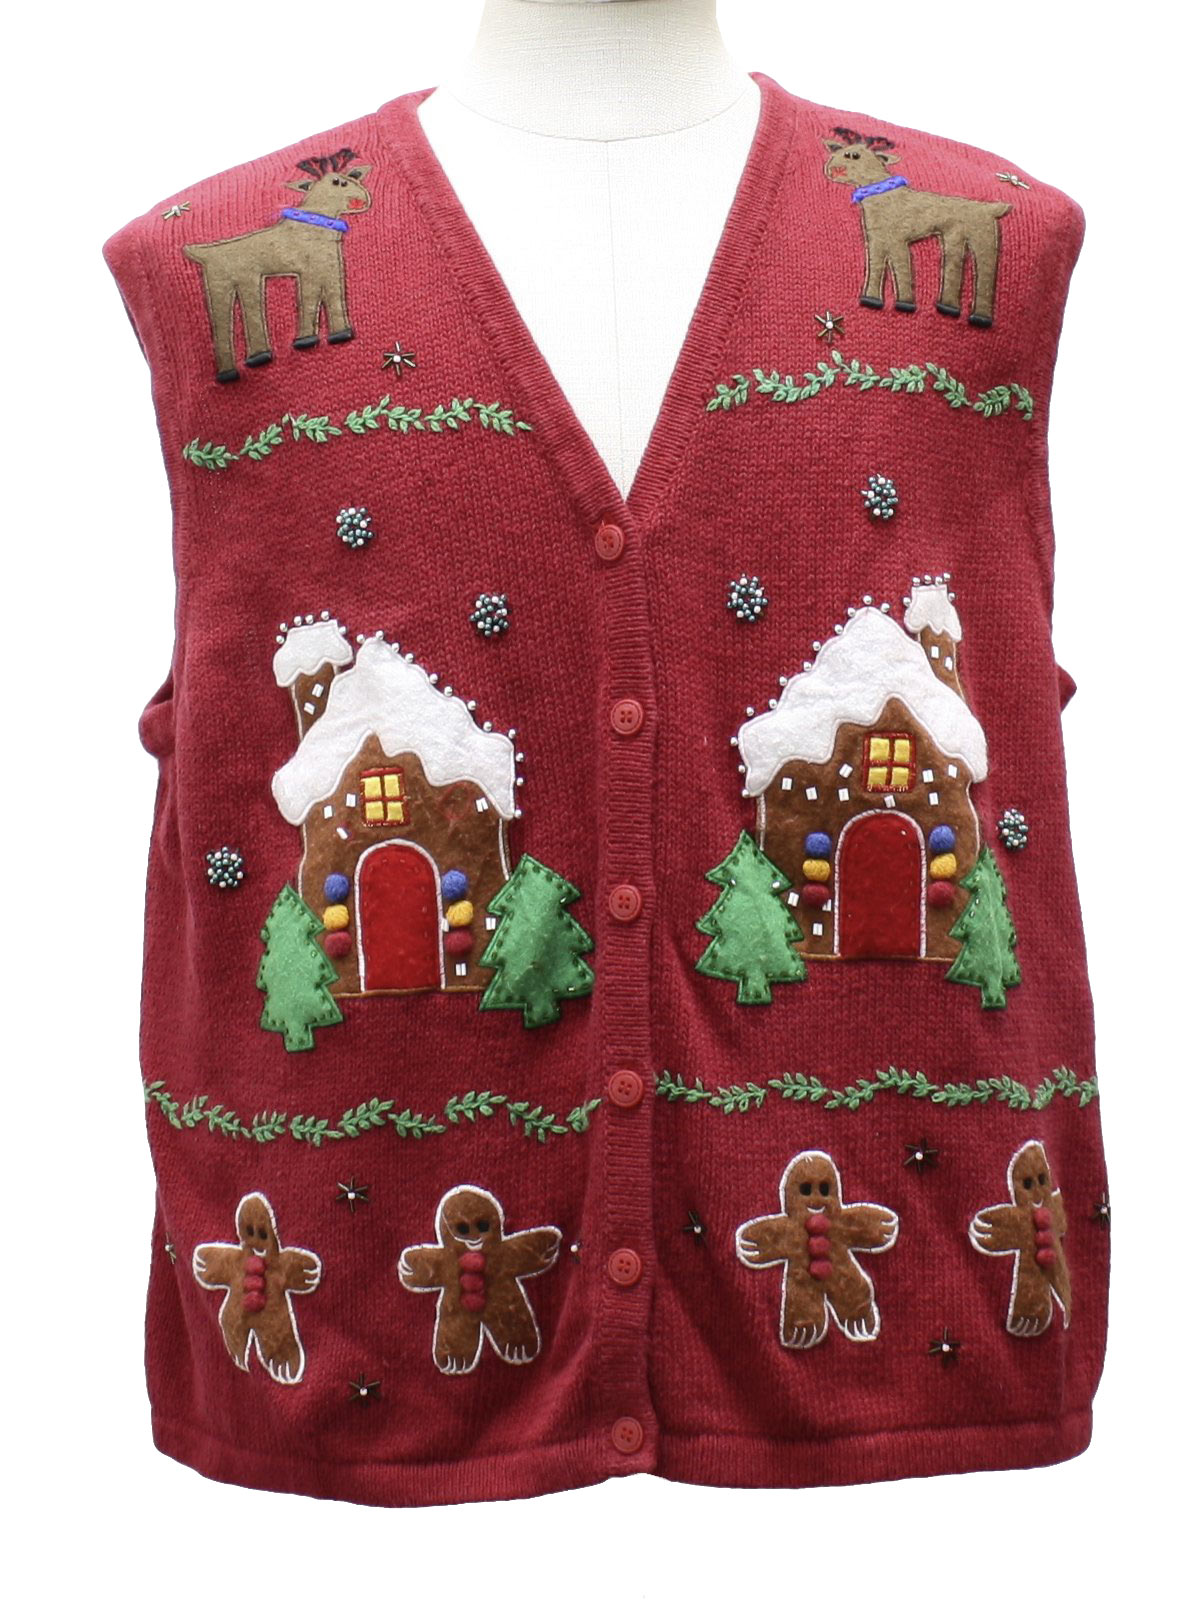 reindeer christmas sweaters ugly christmas sweaters - Reindeer Christmas Sweater